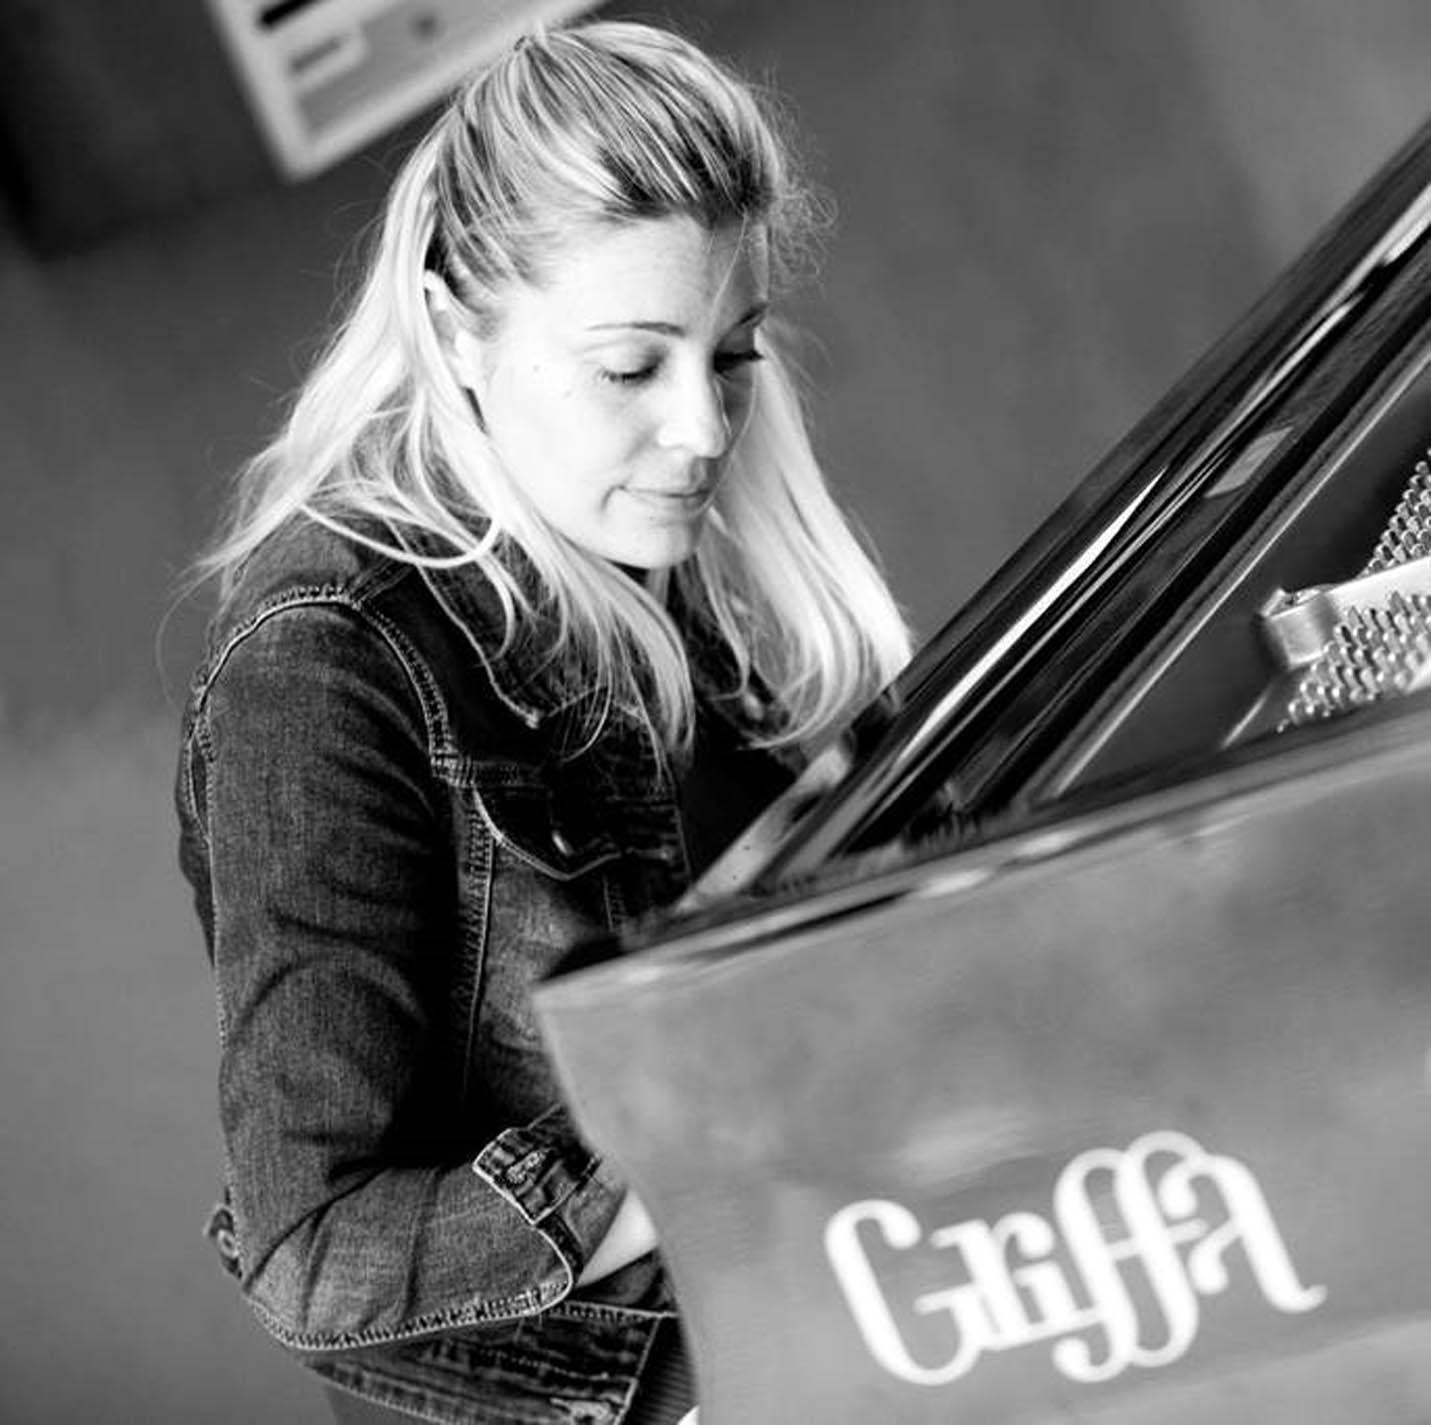 Giulia Malaspina_(credits Fabio Mantegna)_b.jpg